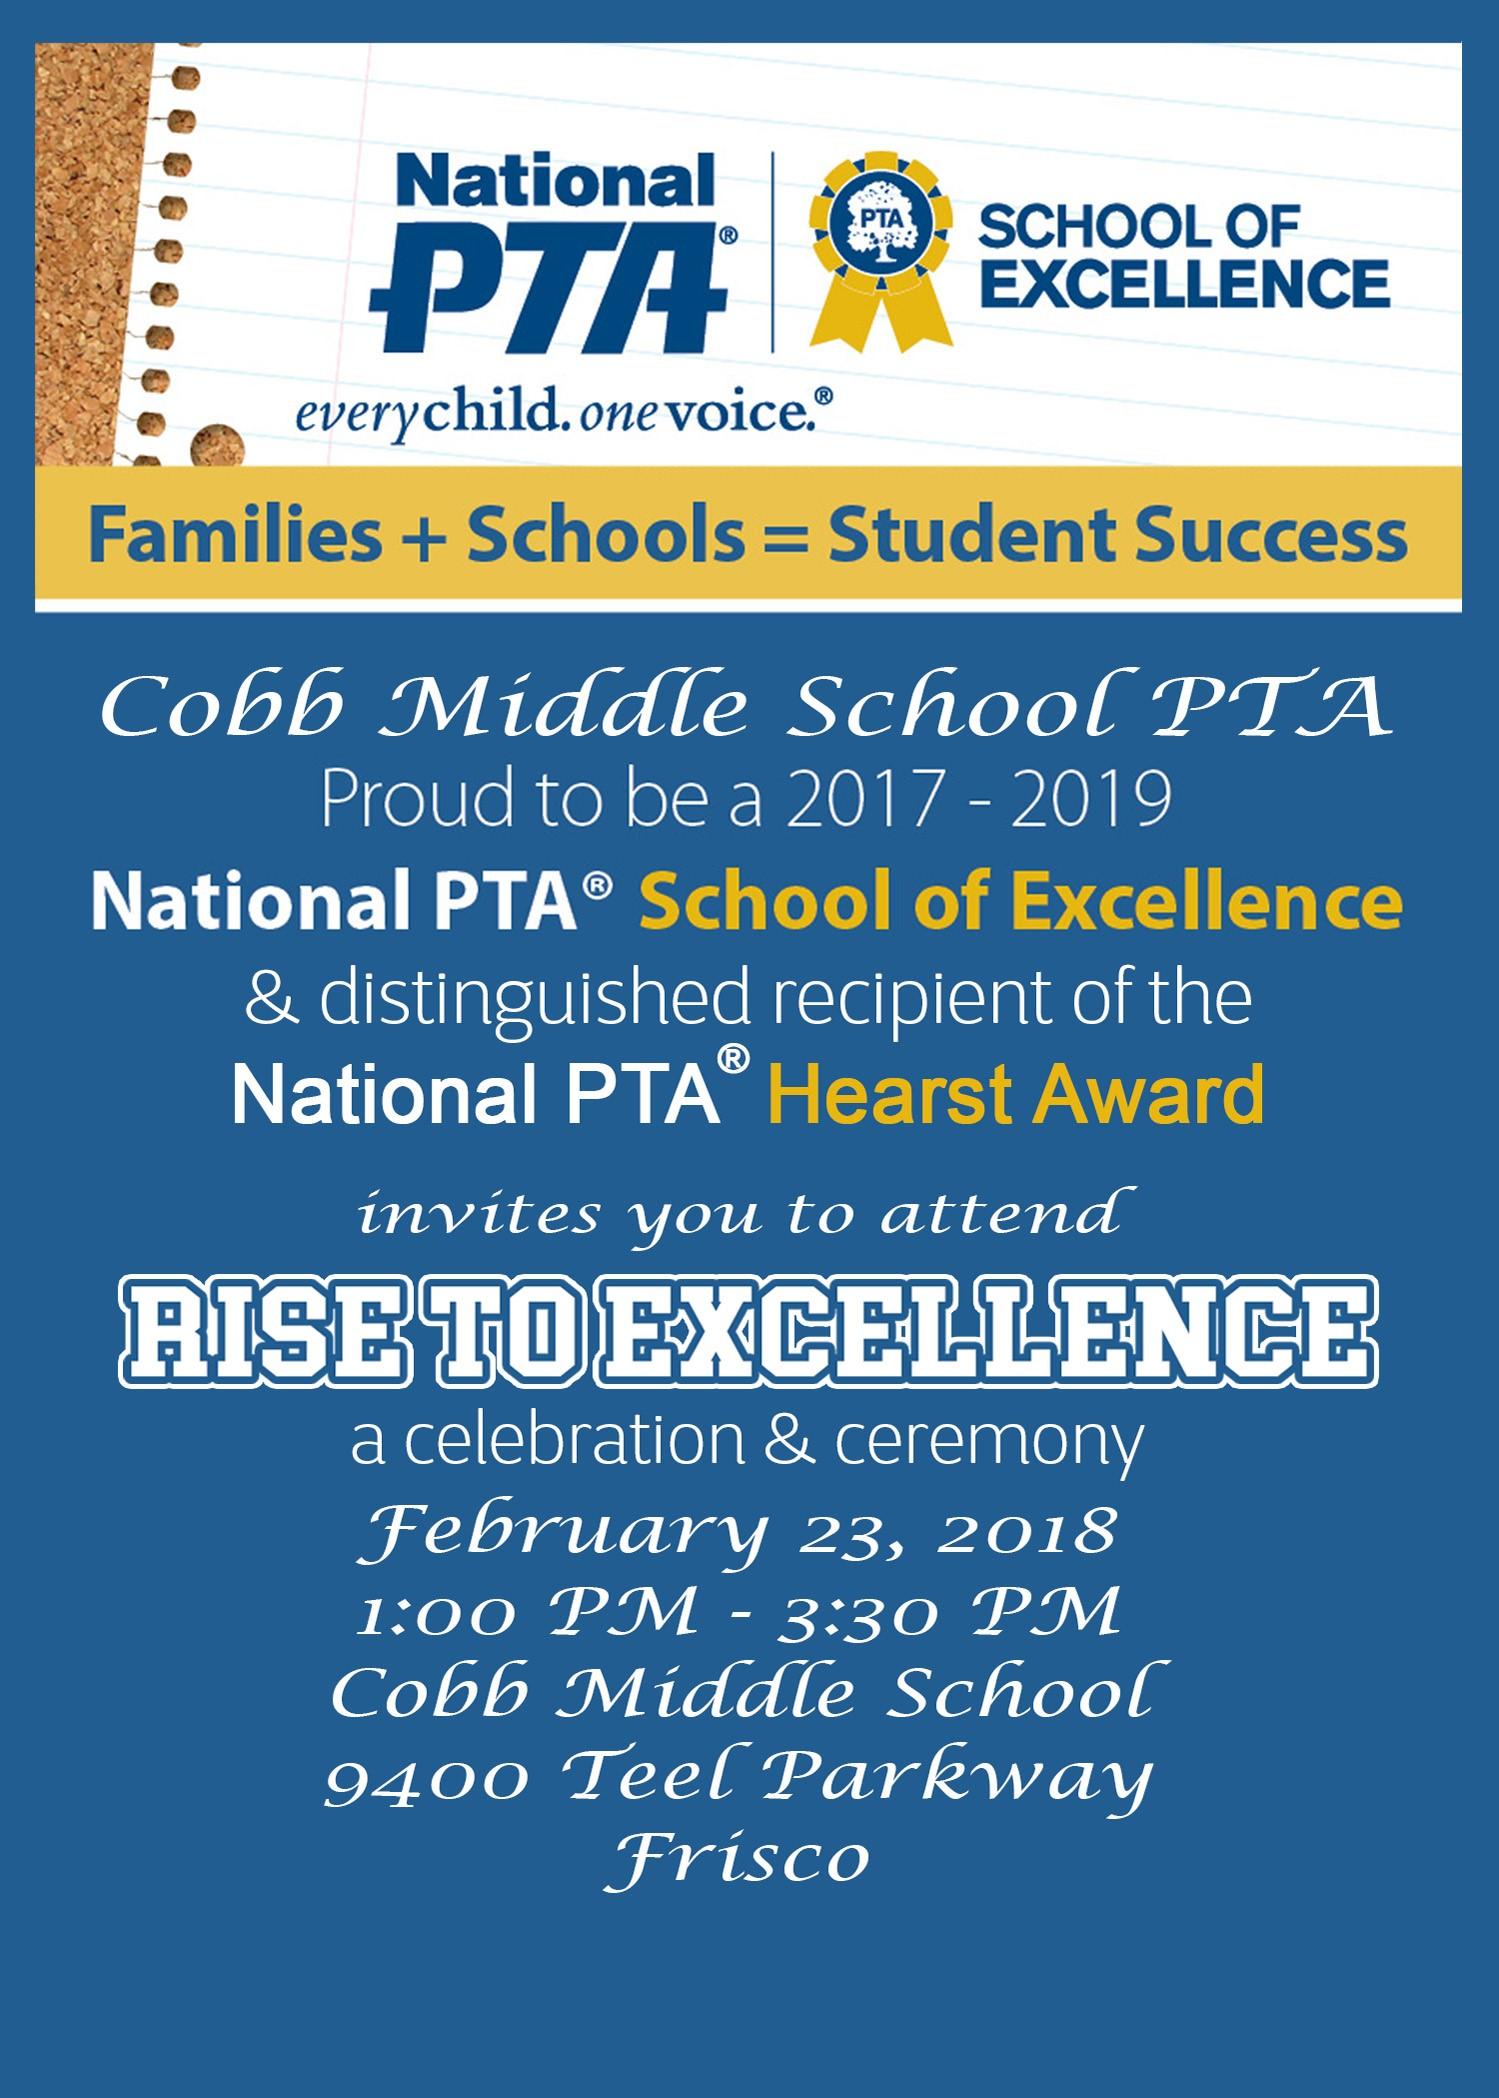 School of excellence celebration kit programs national pta cobb middle school ptas school of excellence and phoebe apperson hearst celebration altavistaventures Images